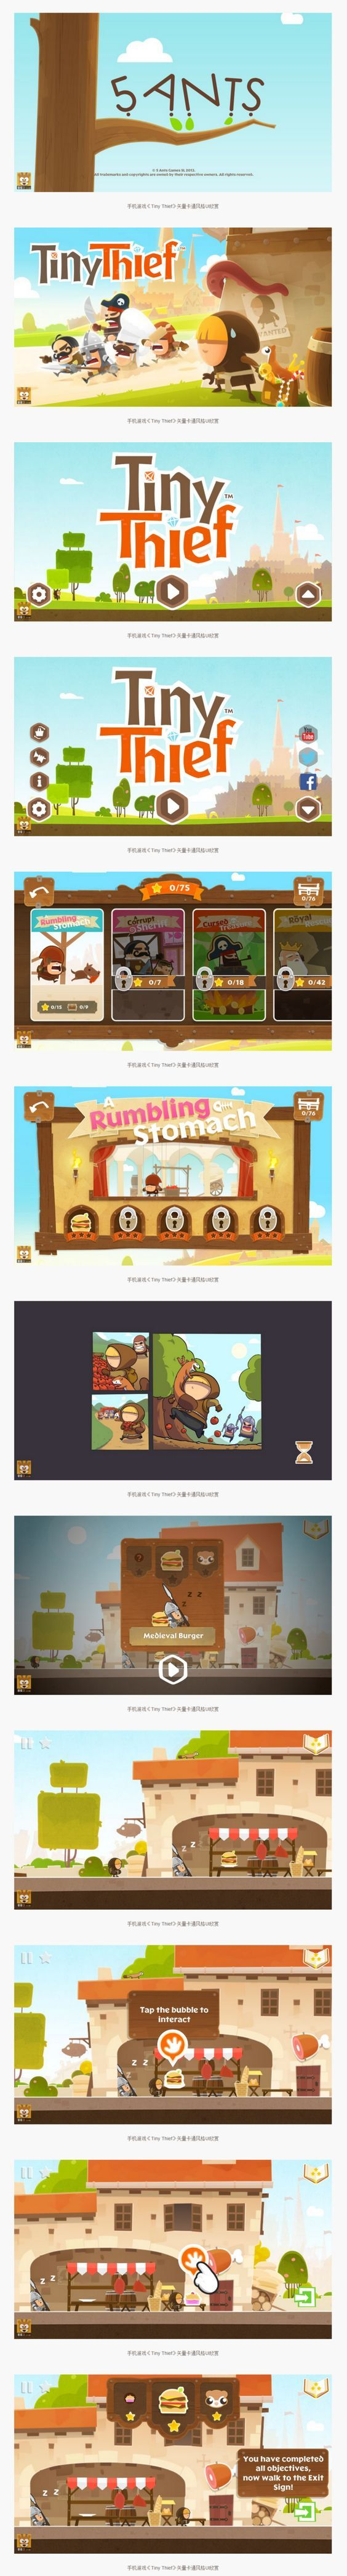 "Mobile game ""Tiny Thief"" Vector cartoon ...:"